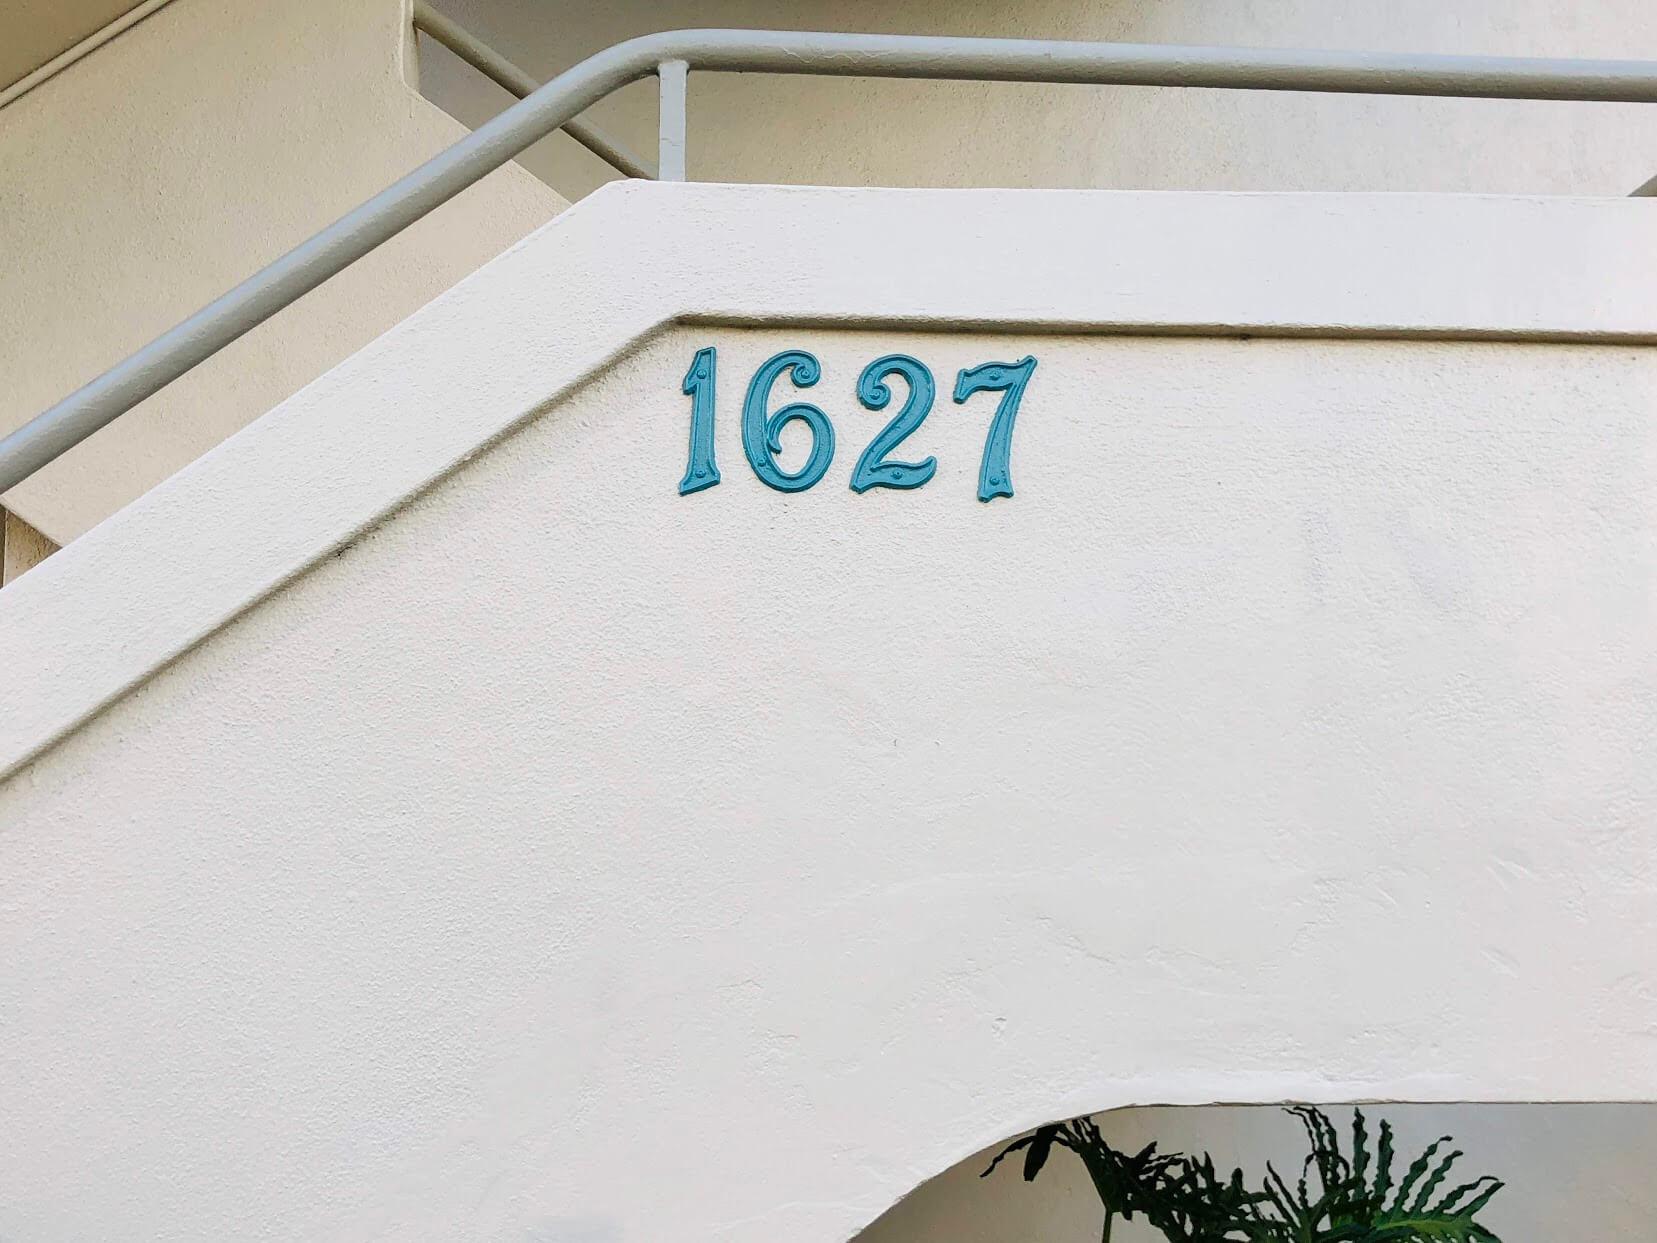 Marina Gardensの番号